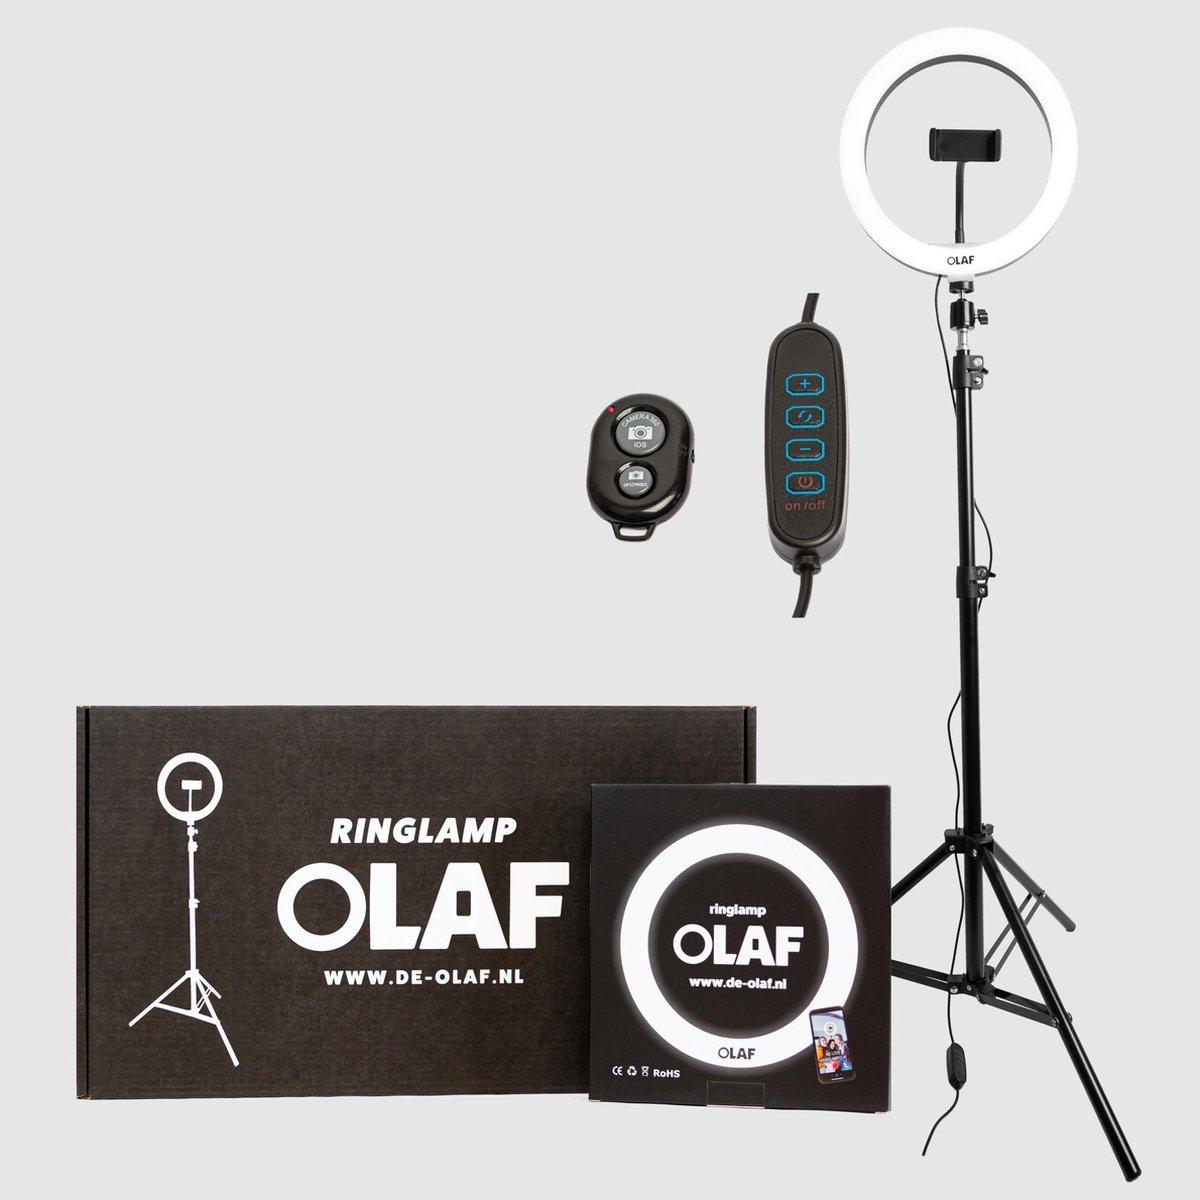 OLAF - Ringlamp - Tiktok lamp - Ringlight - 10inch - Standaard/statief 160cm - LED verlichting - Mak